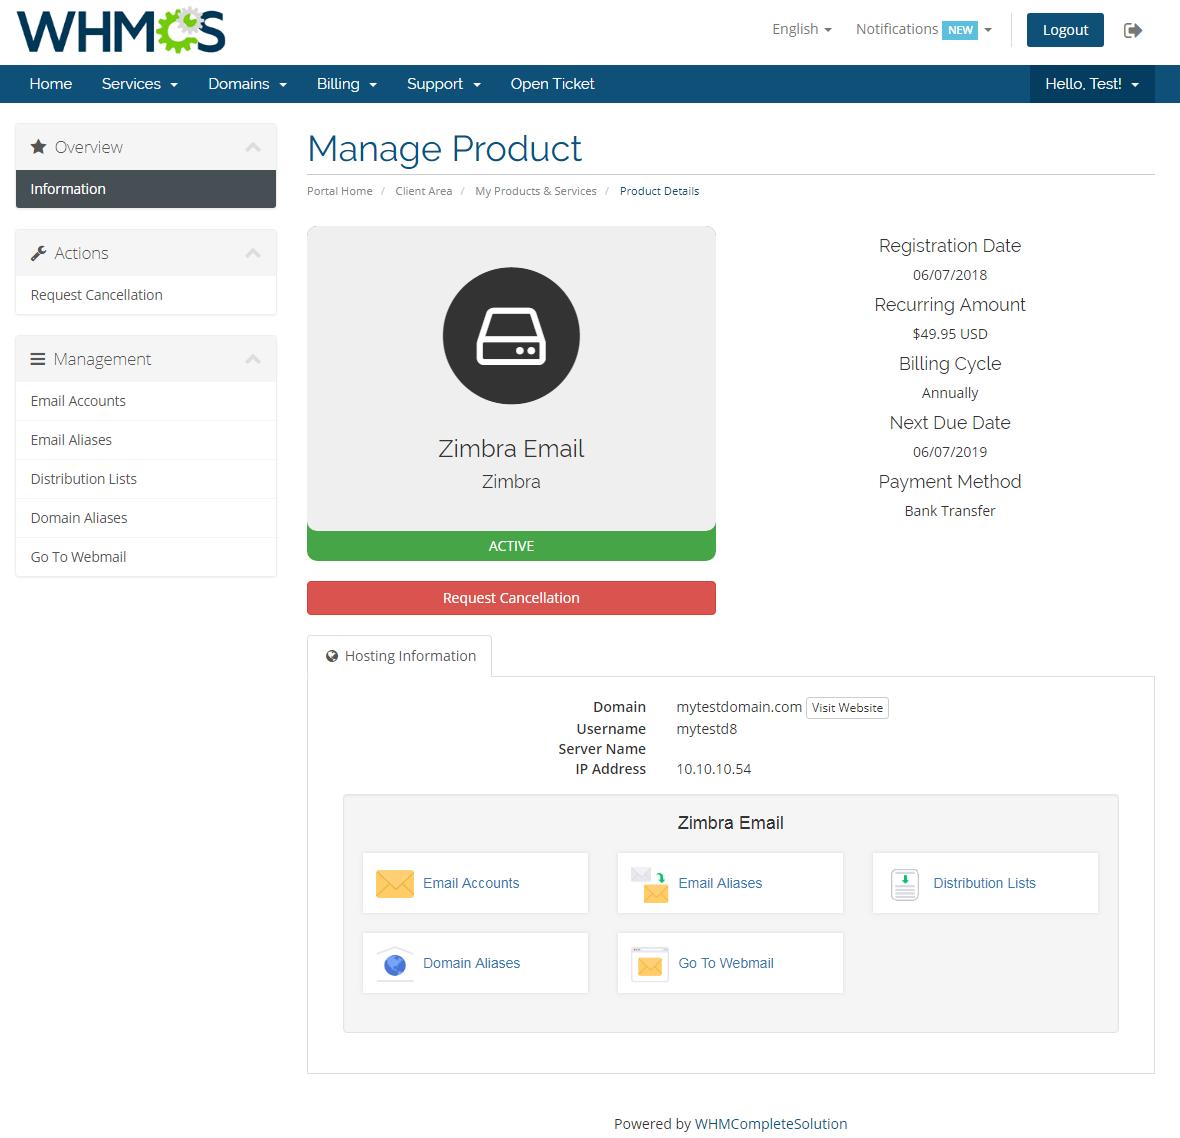 Zimbra Email For WHMCS: Module Screenshot 1